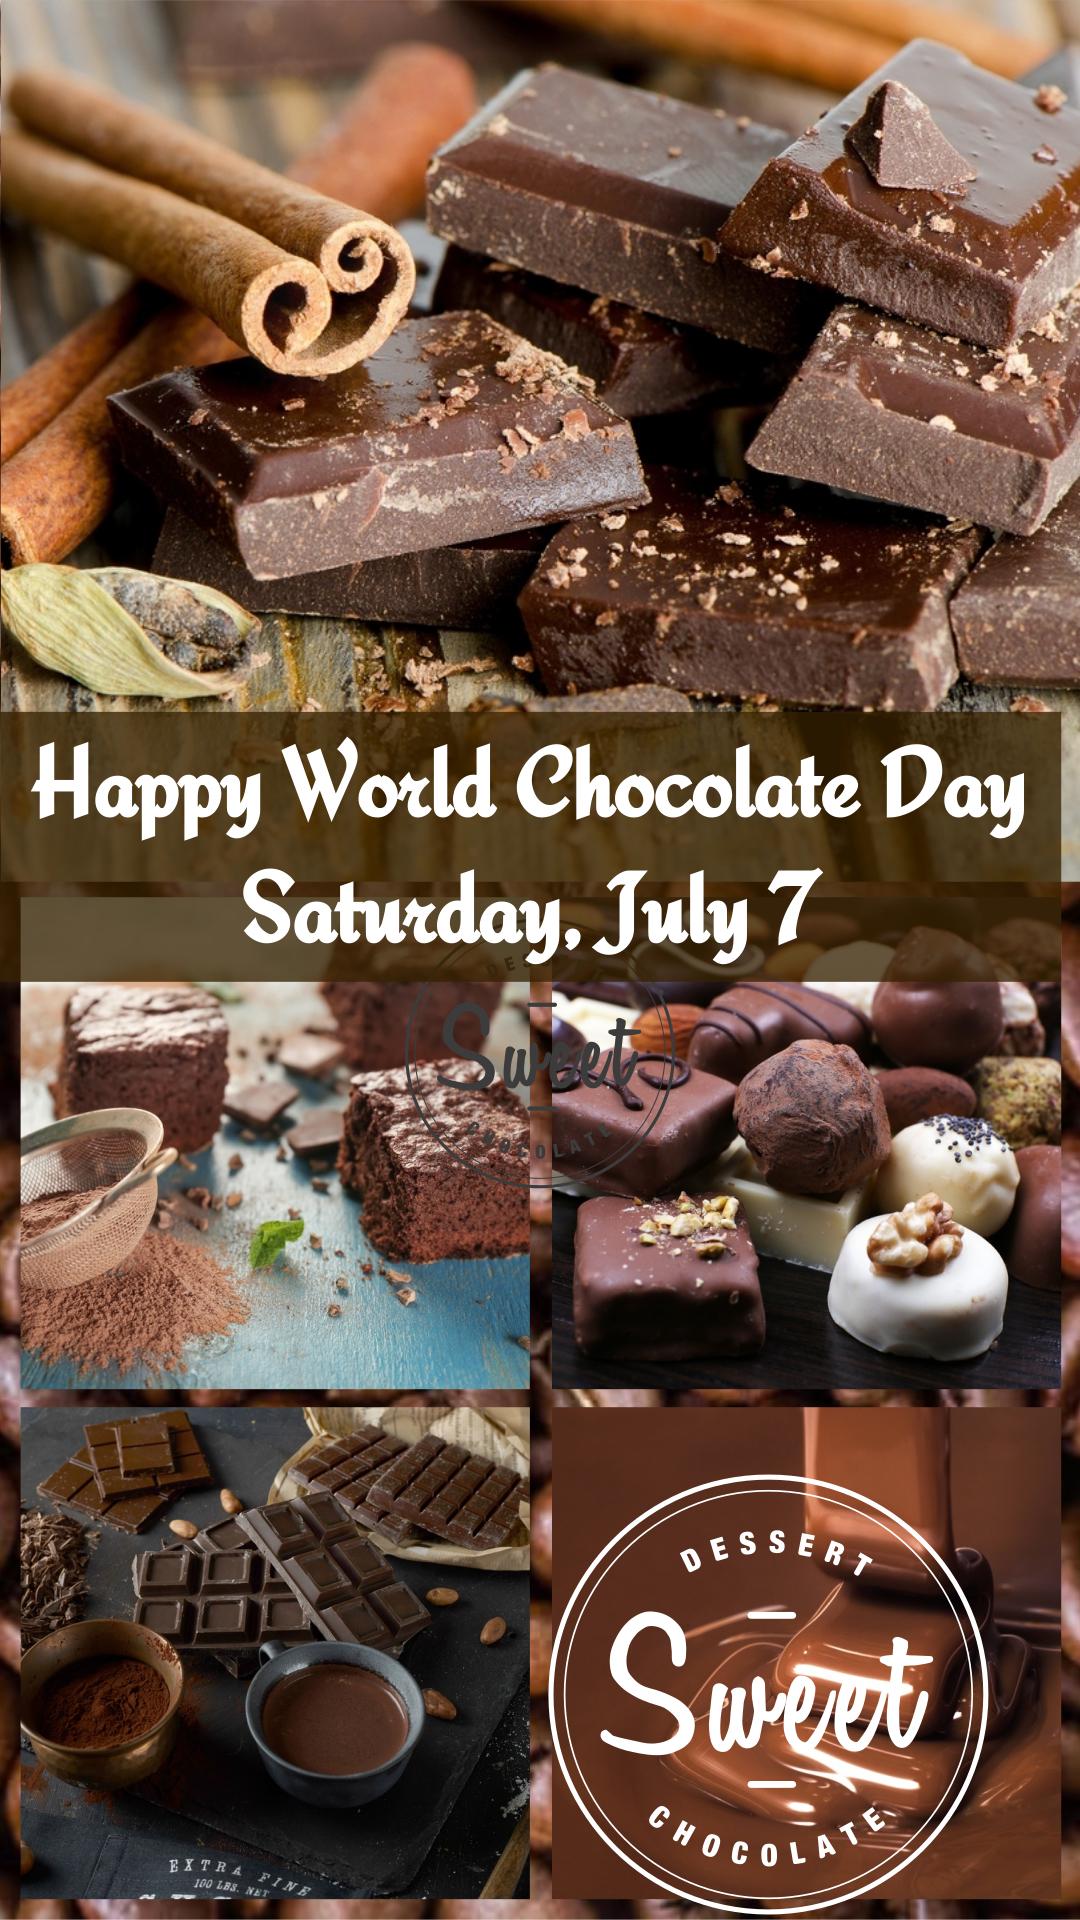 Celebrate World Chocolate Day July 7 - Fun Chocolate Facts!